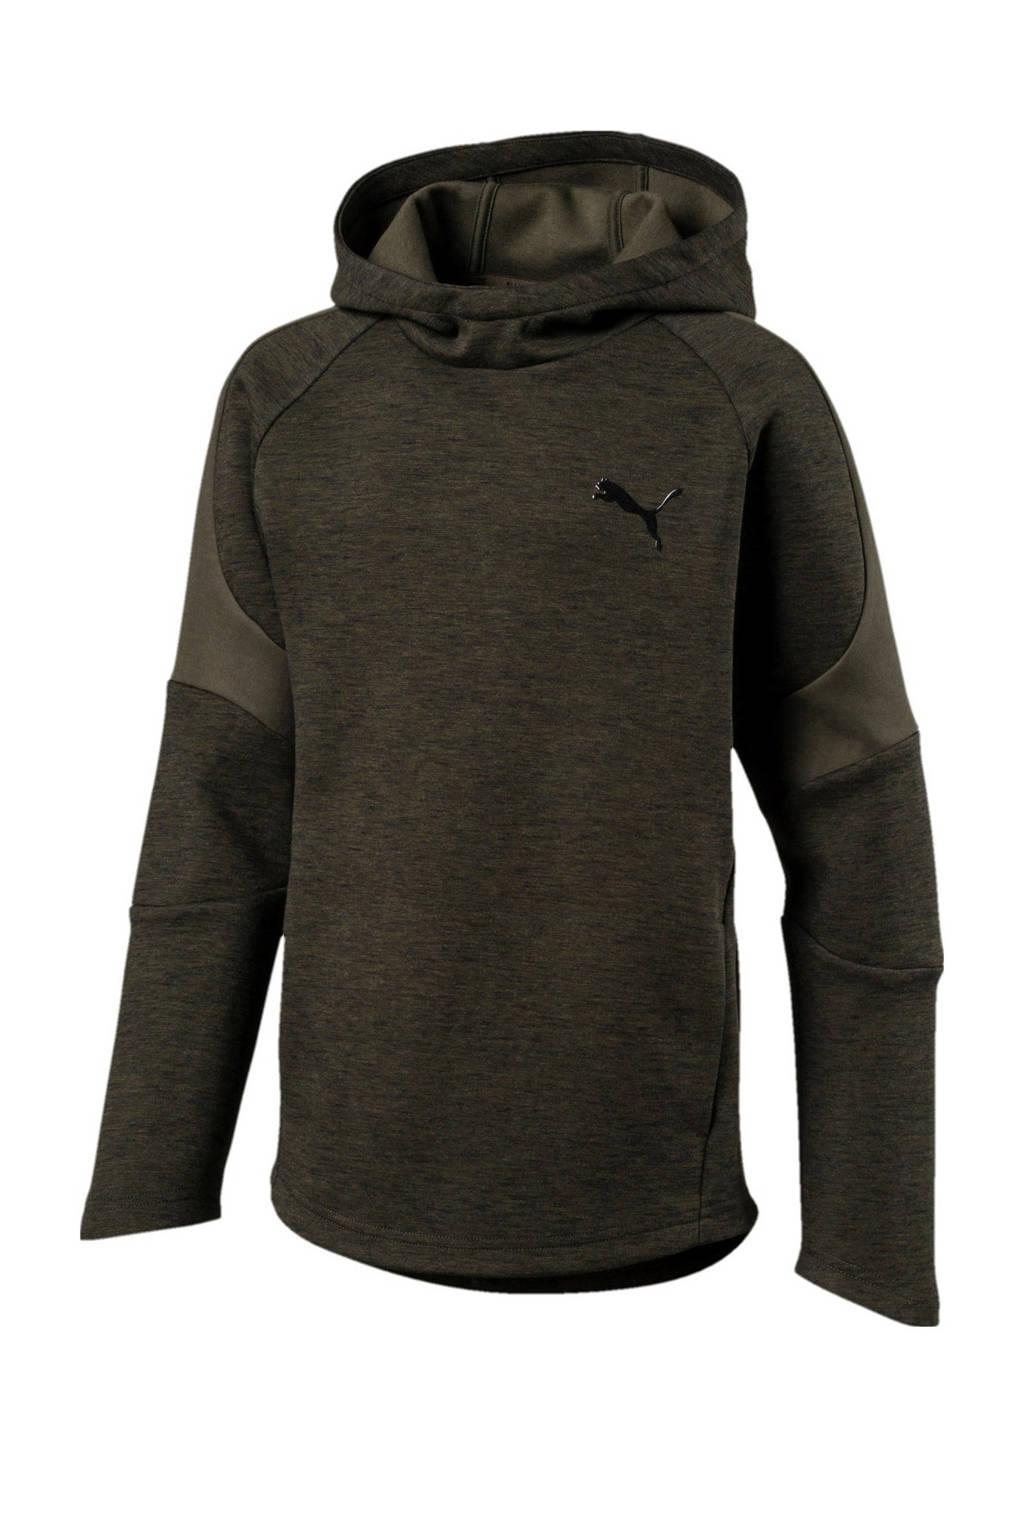 Puma   Evostripe hoodie donkergroen, Donkergroen